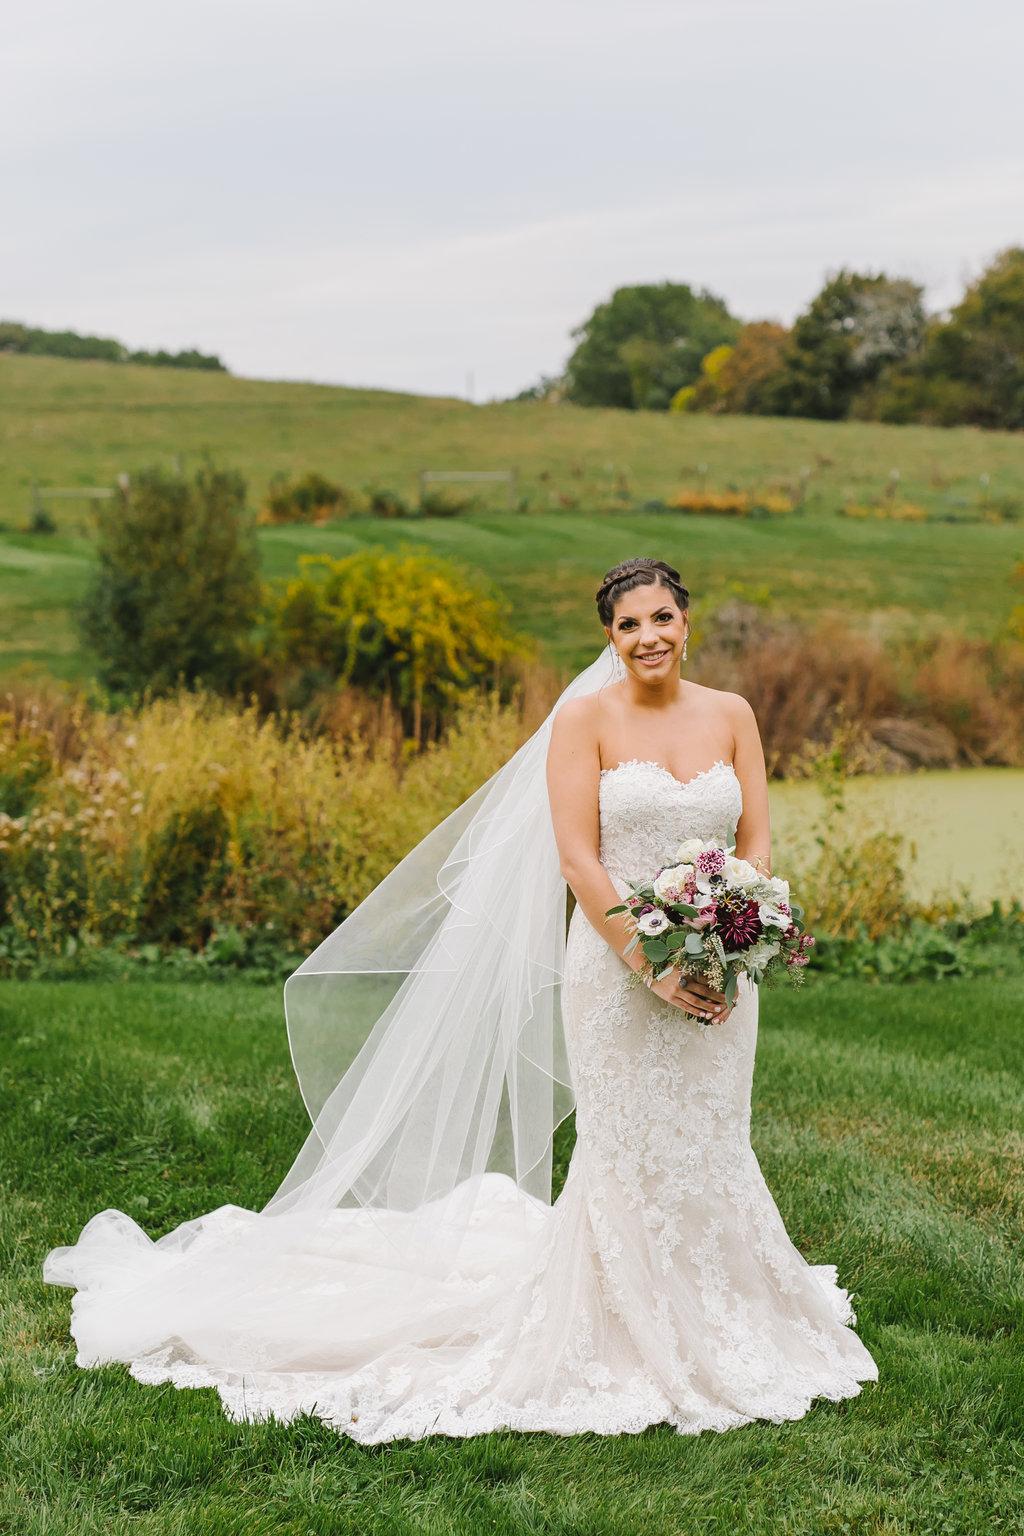 Bianca+CoreyWedding-EmilyTebbettsPhotography--150.jpg